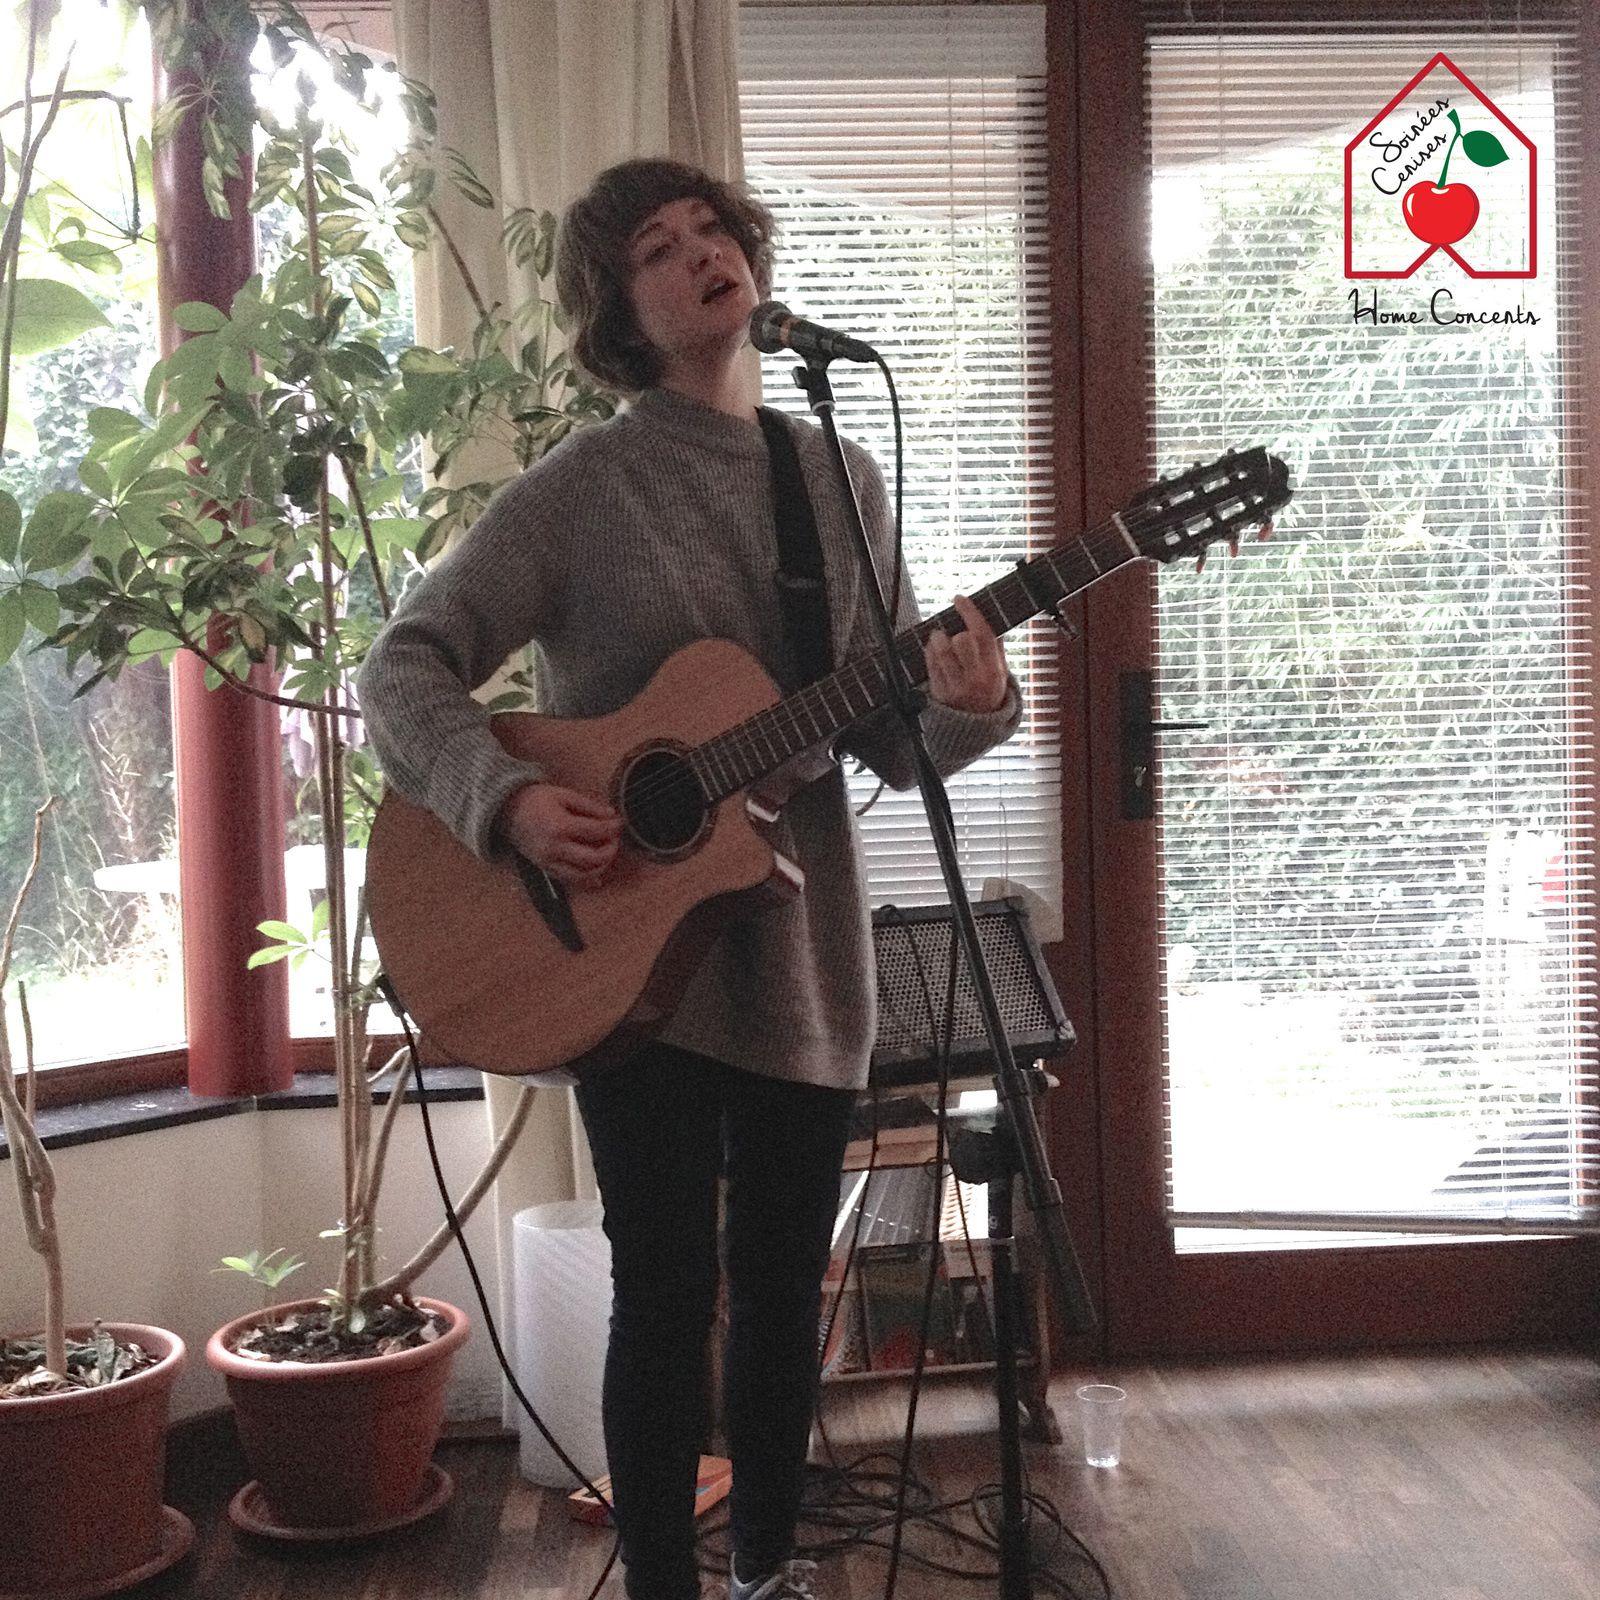 ▶ Brooke Sharkey (UK) @ Home concert (Drogenbos Château) - 01/05/2017